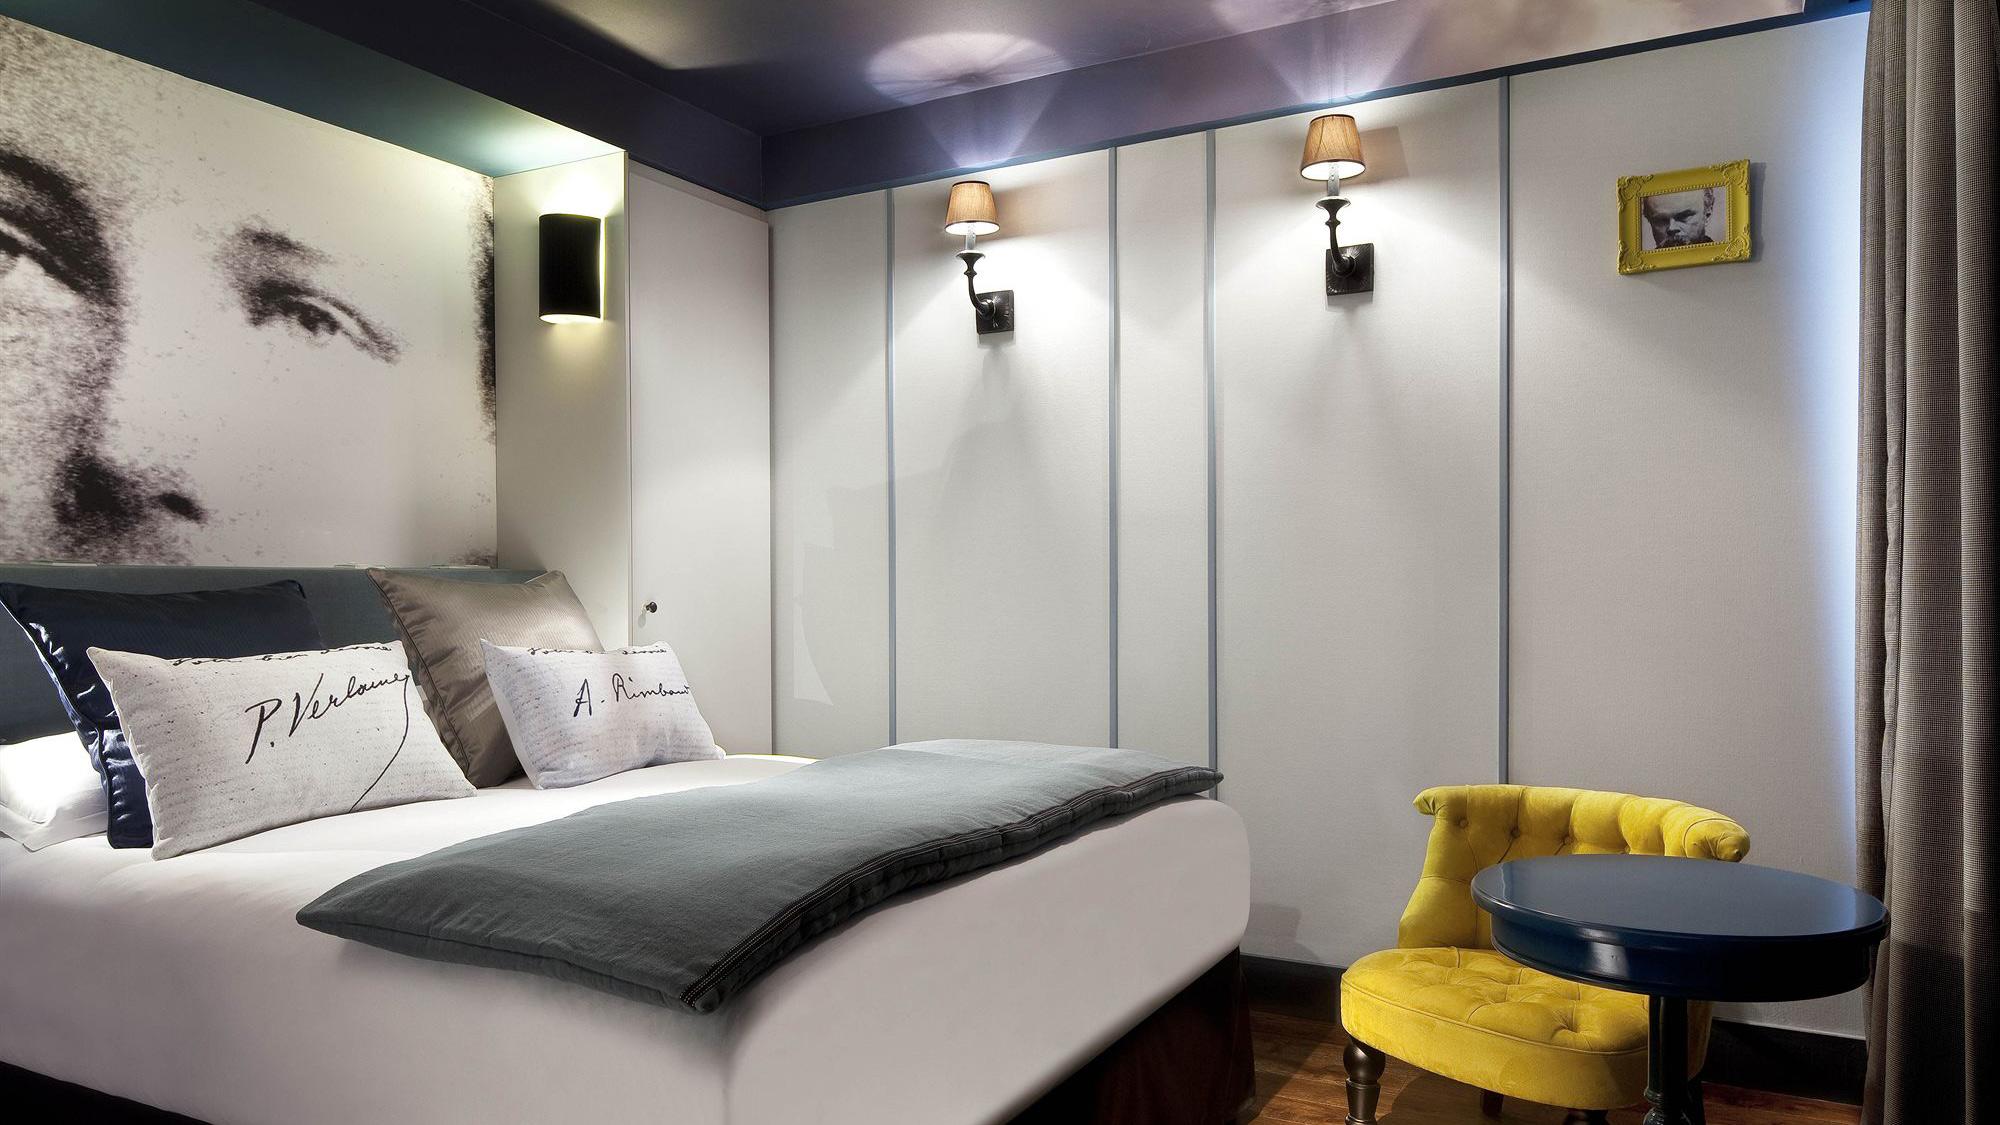 top 5 hotels list to stay during maison et objet inspirations essential home. Black Bedroom Furniture Sets. Home Design Ideas